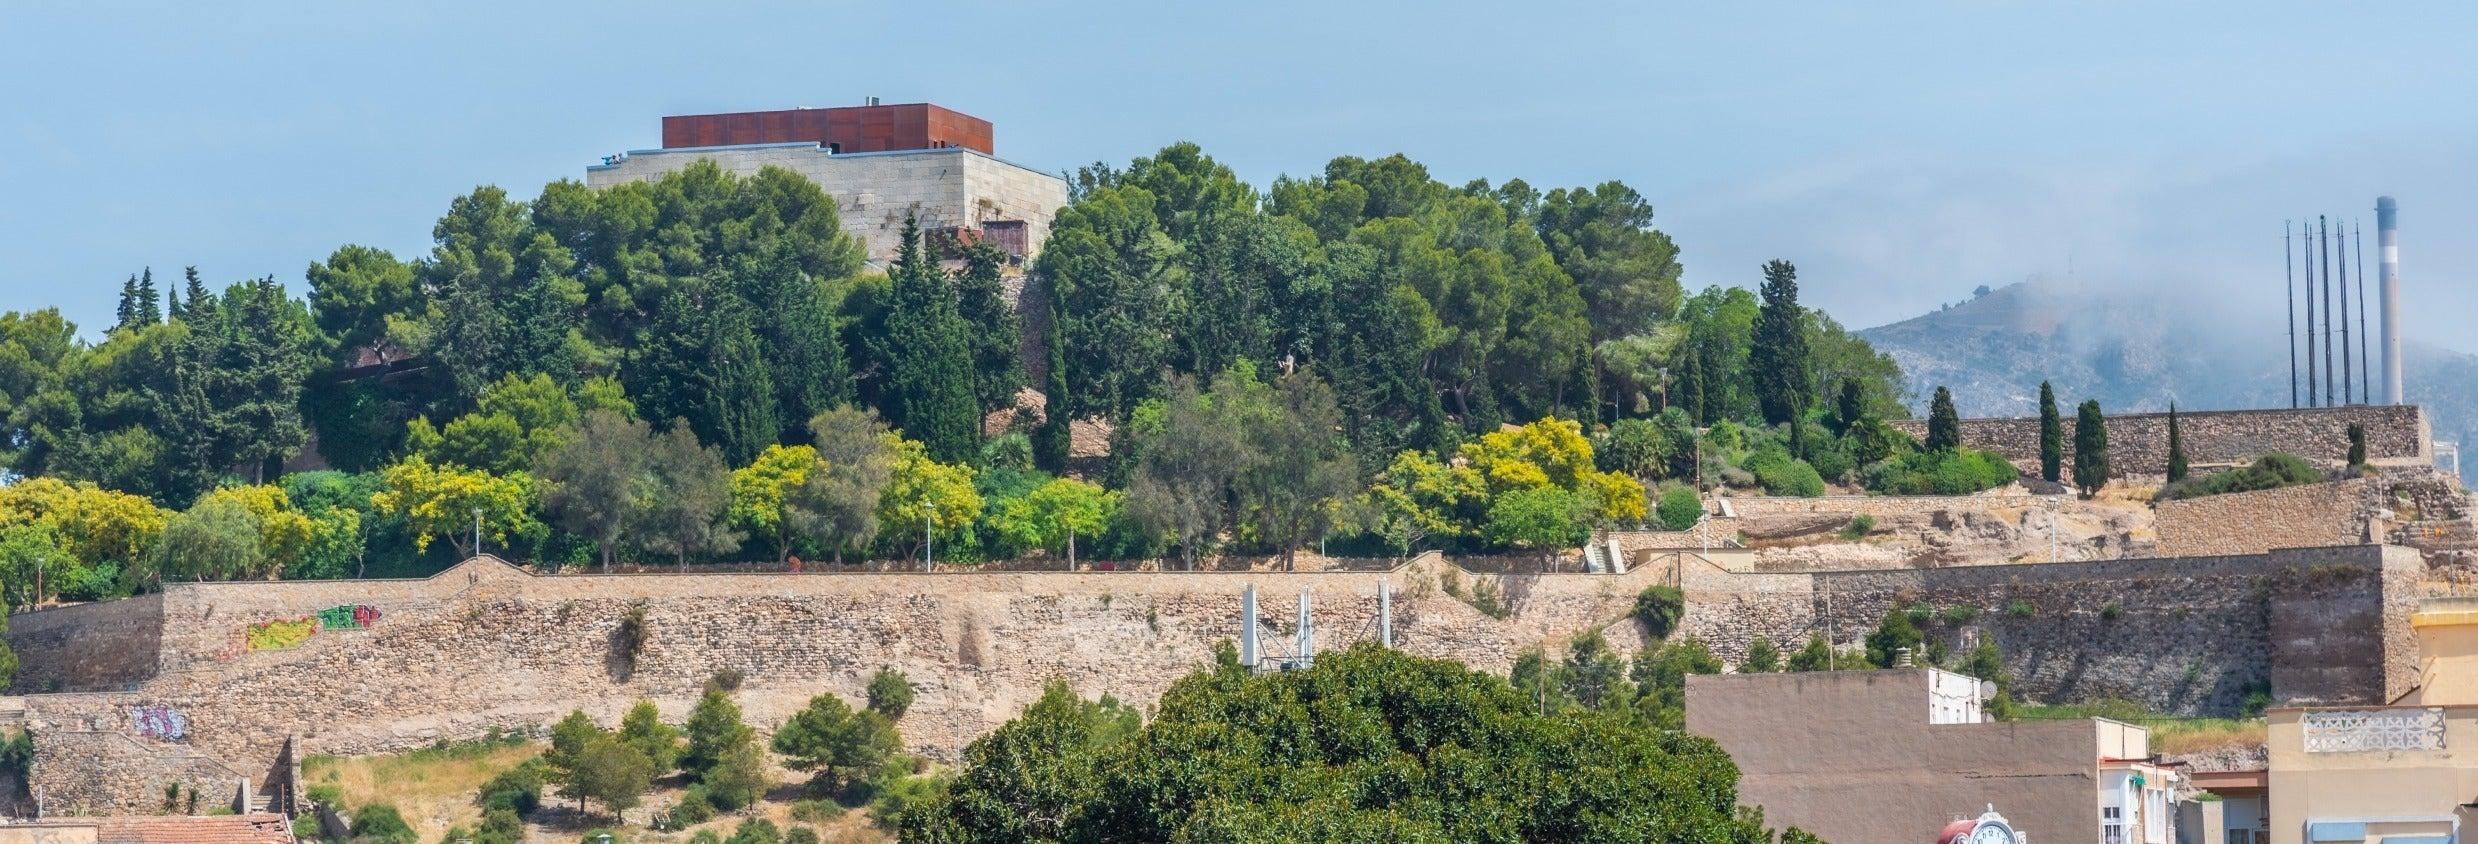 Ingresso do castelo da Concepción + Elevador panorâmico